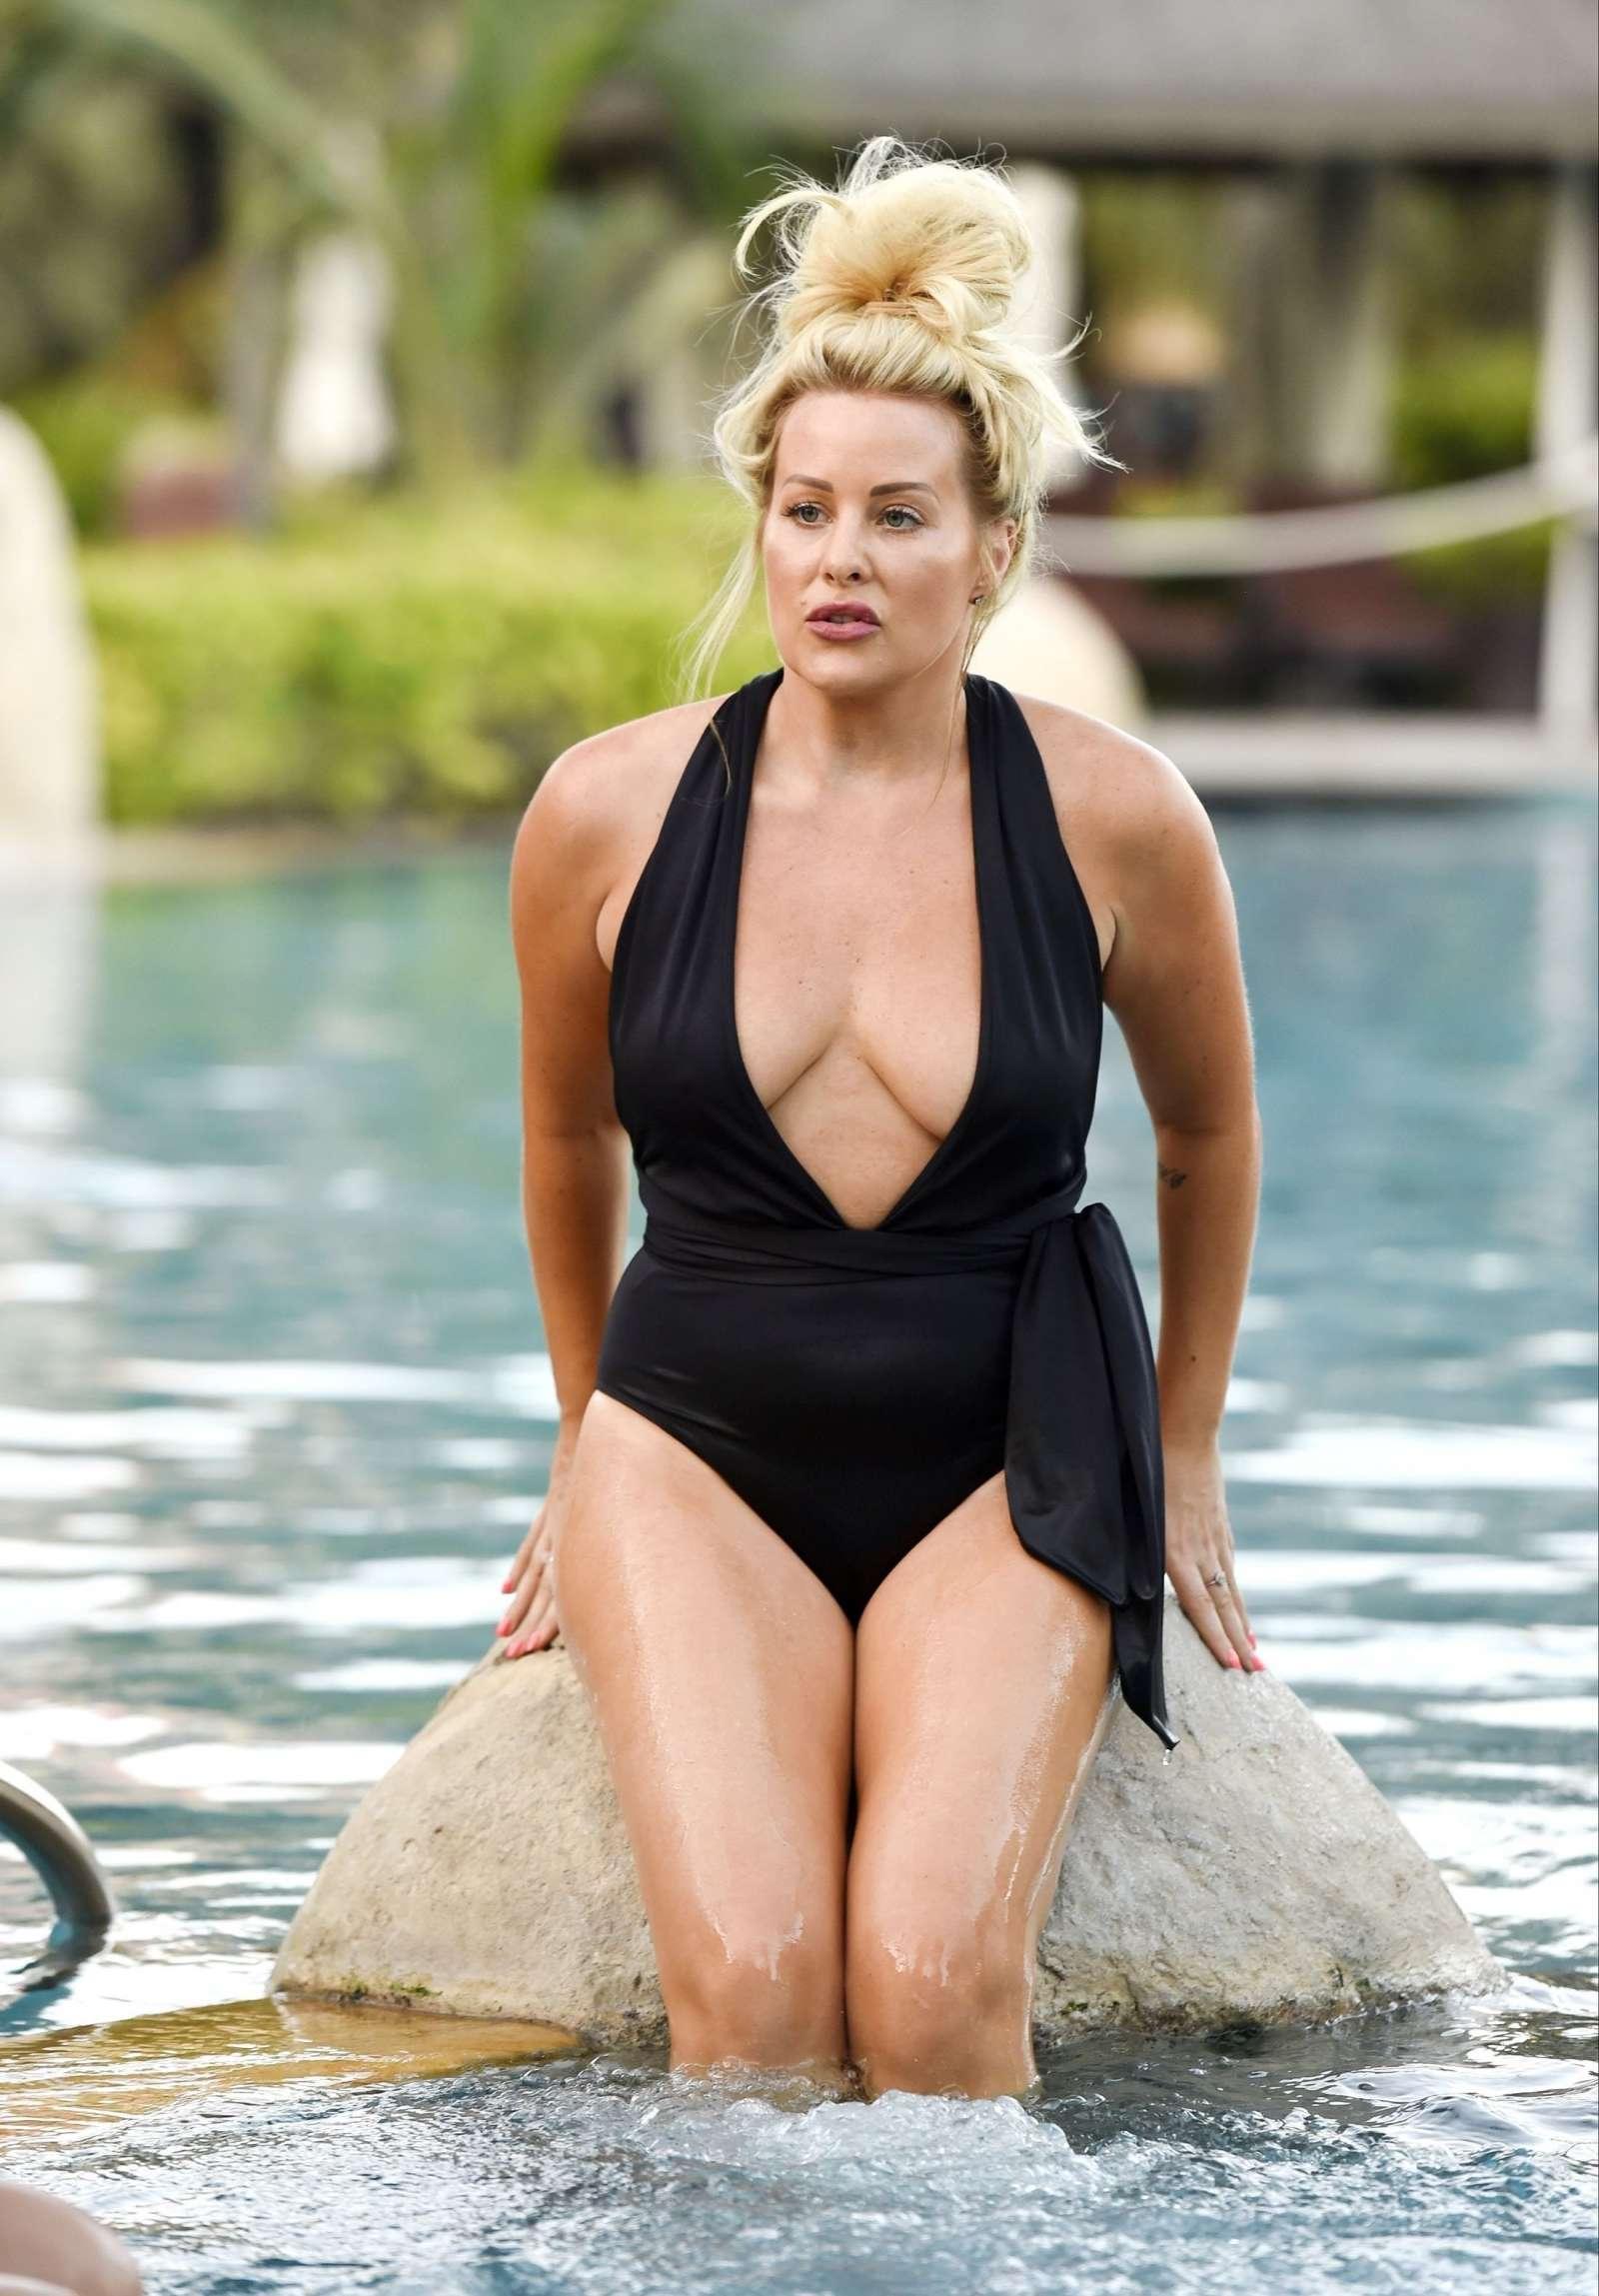 Selina Waterman-Smith in Swimsuit at a pool in Dubai